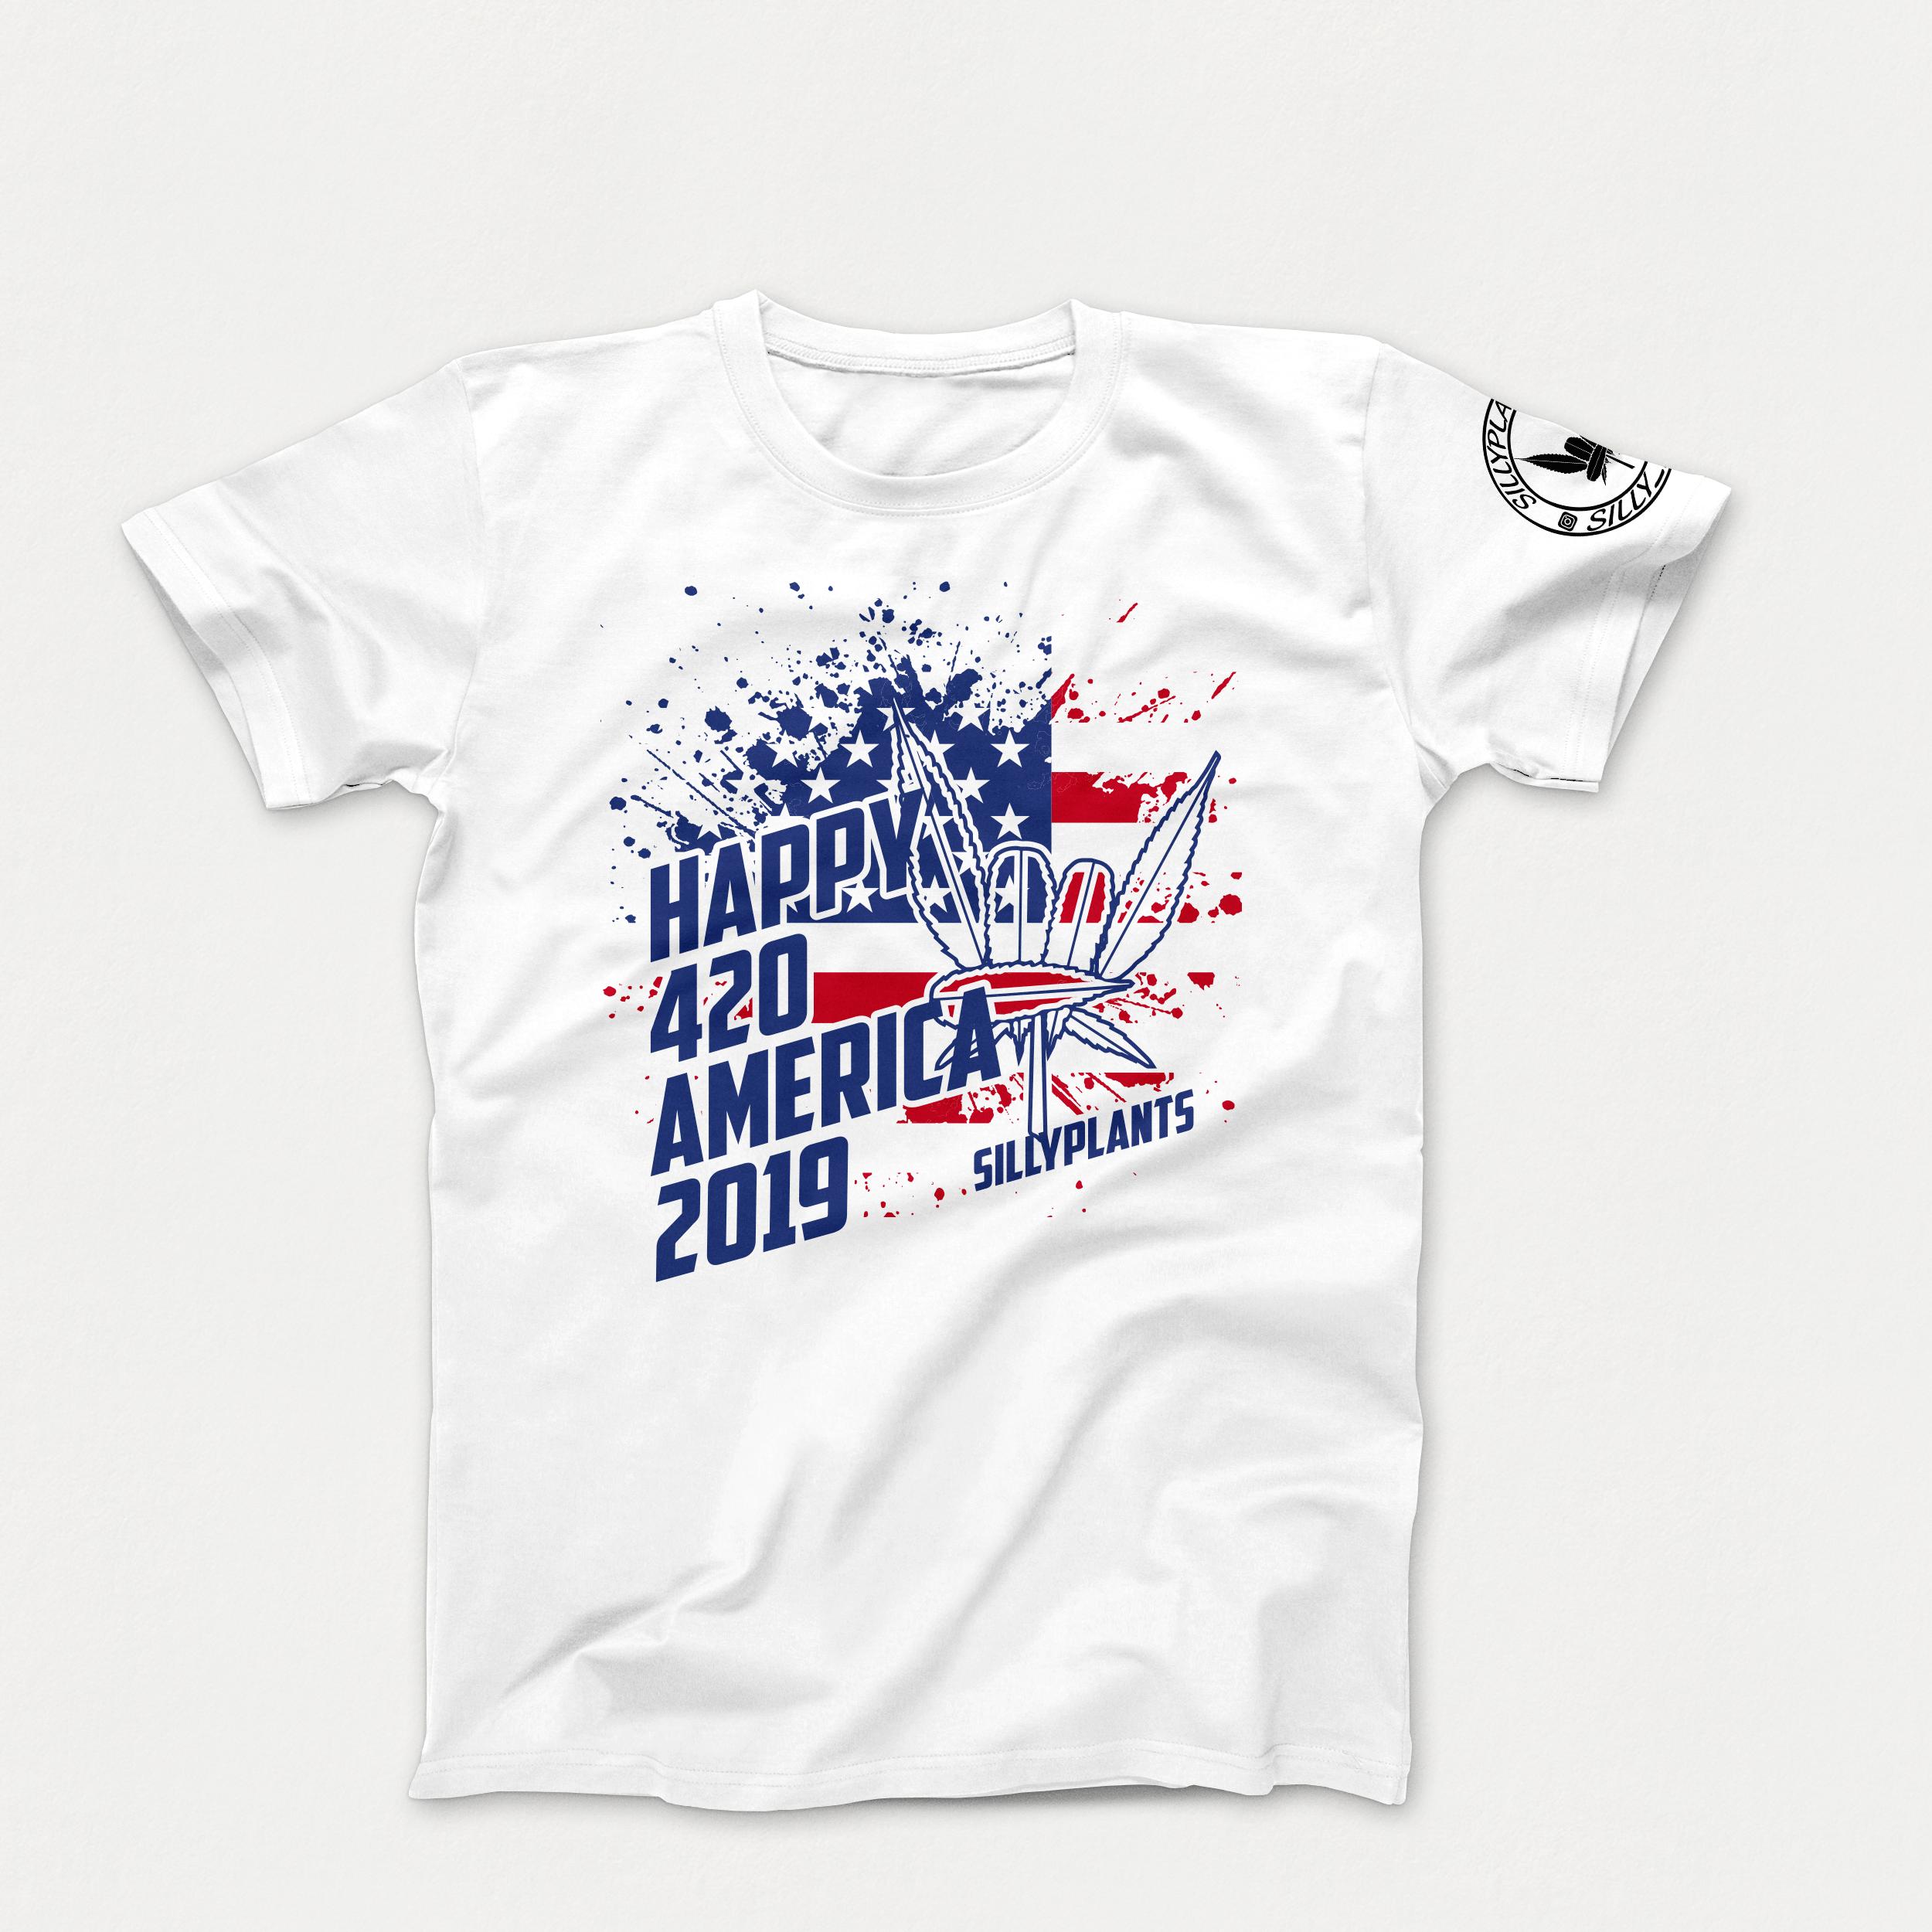 420 America T-Shirt Mockup Template.png